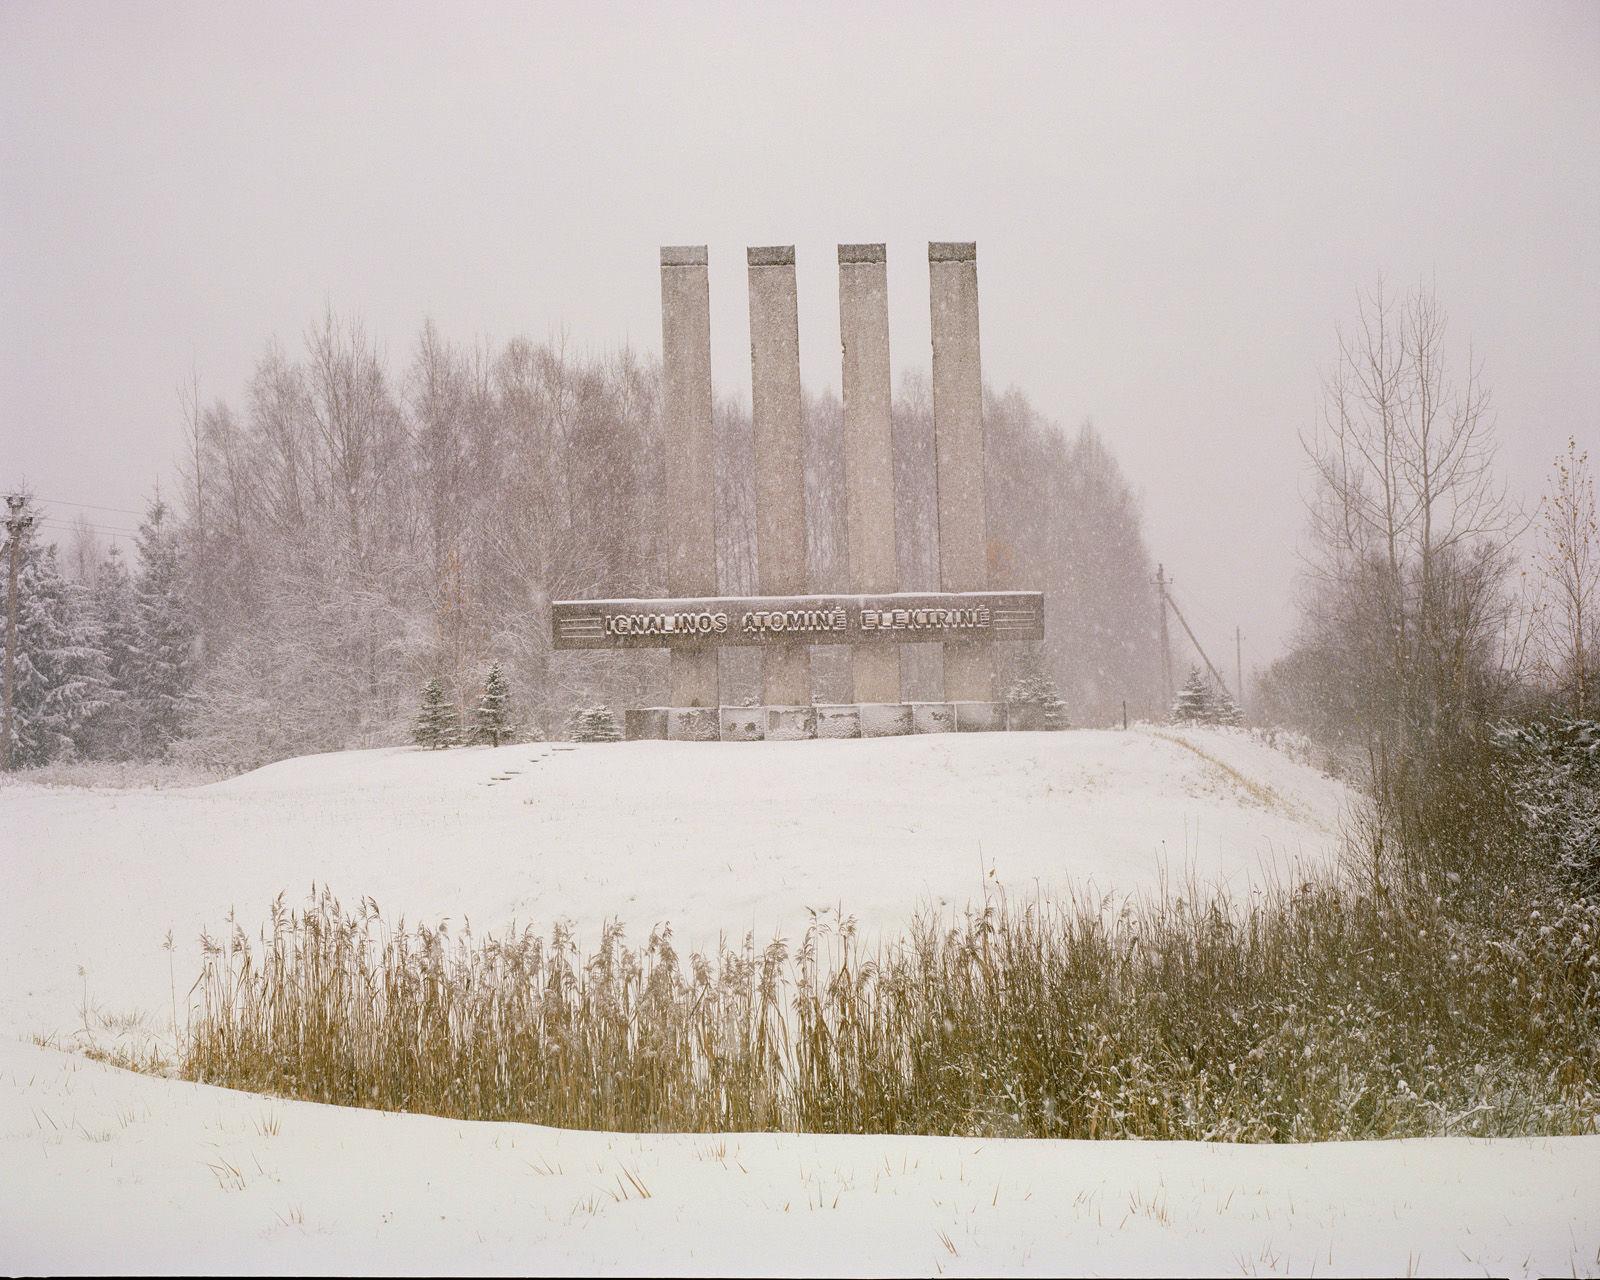 Das Atomkraftwerk Ignalina